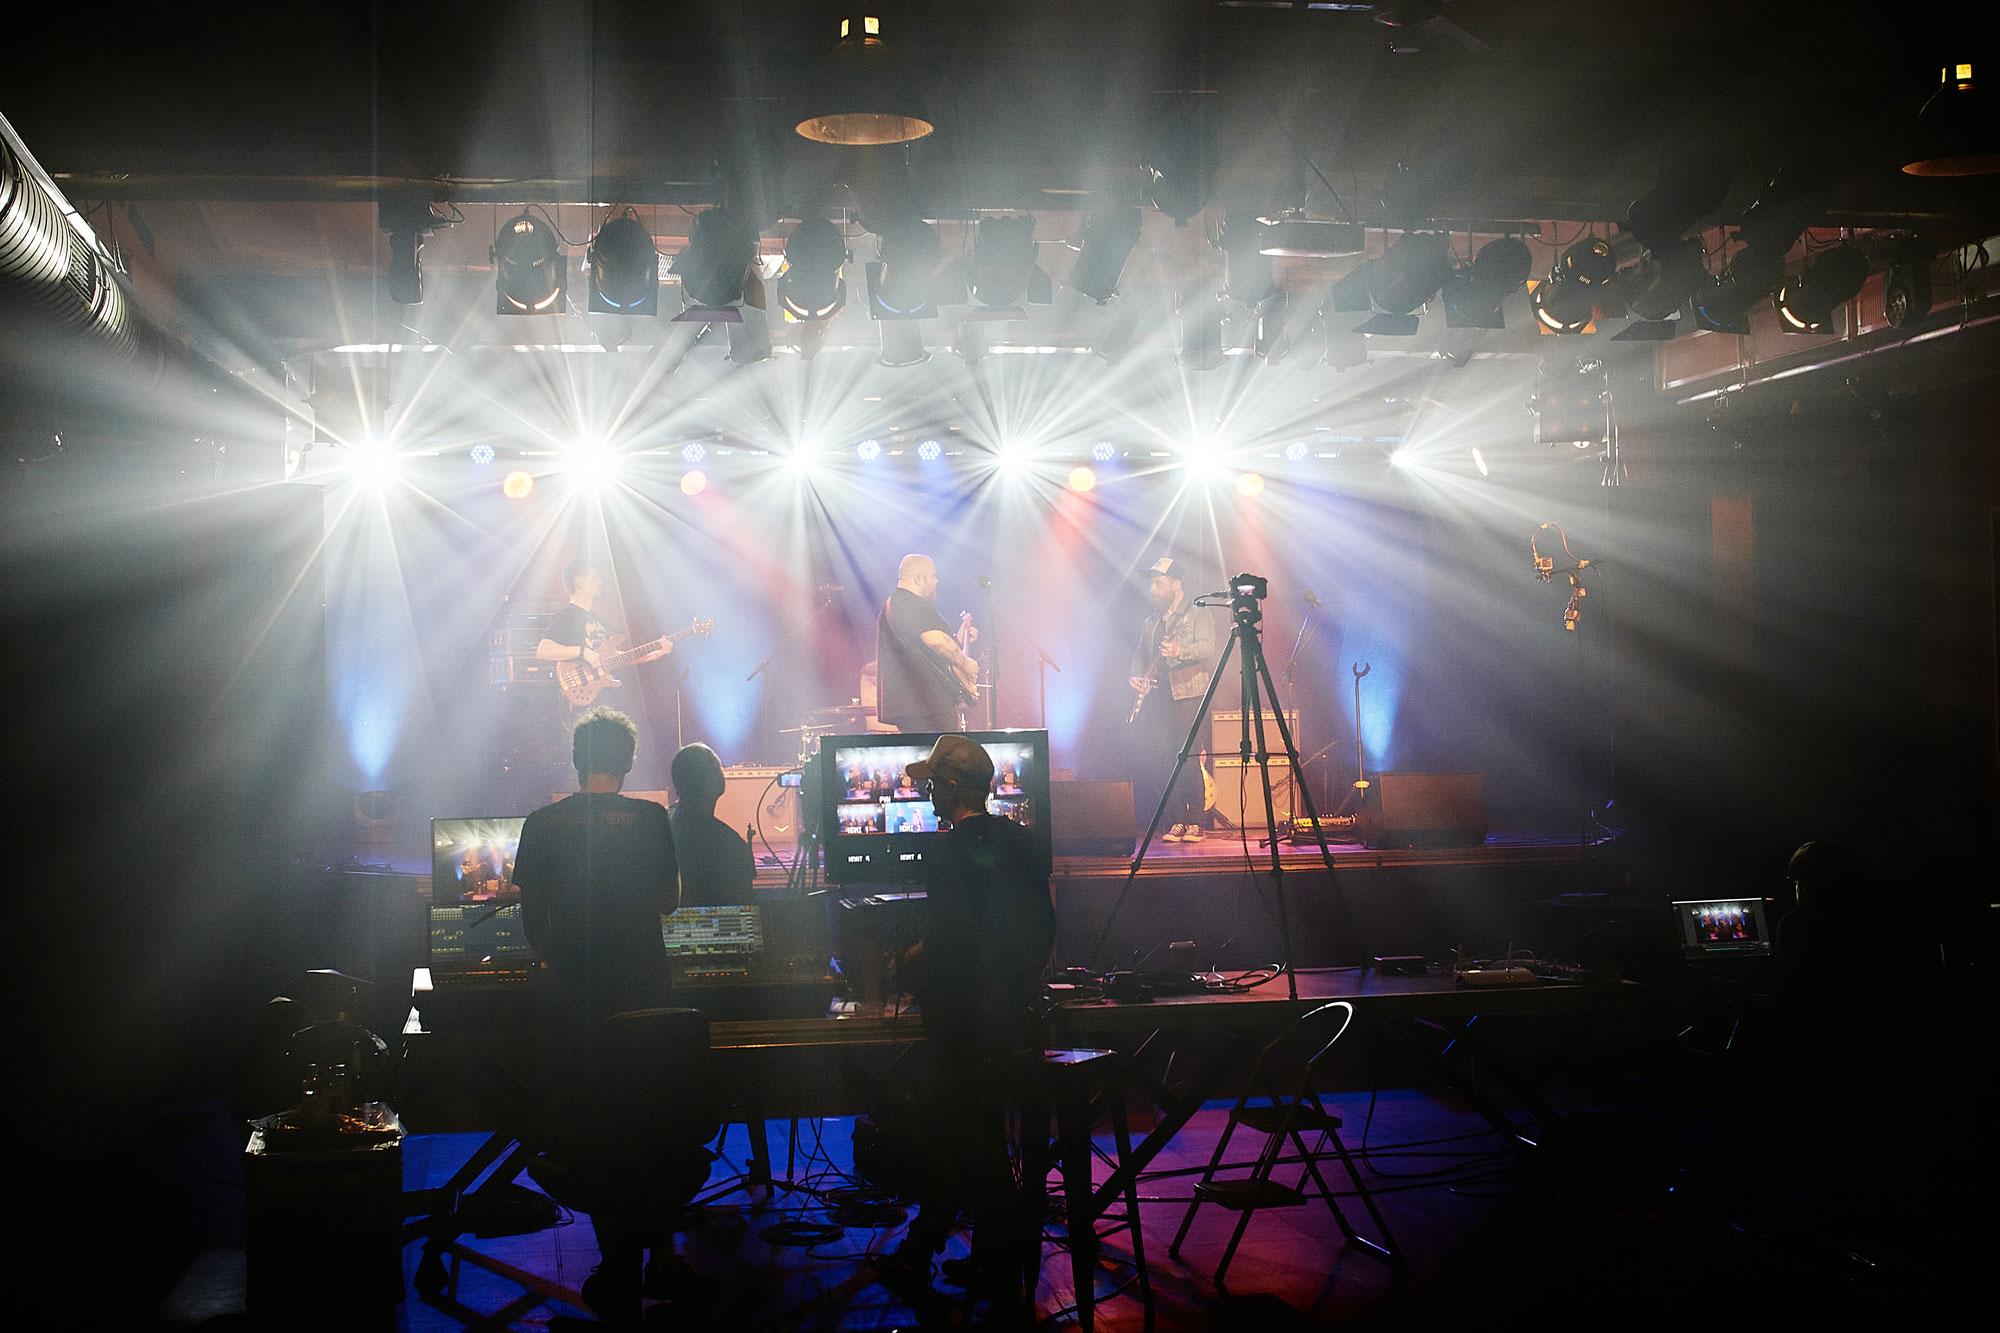 Livestream, Livestreaming, Streaming, Marc Brockmöller, Rockmiller, Youtube, Twitch, Facebook, Andreas Kümmert, Colos Saal, Aschaffenburg